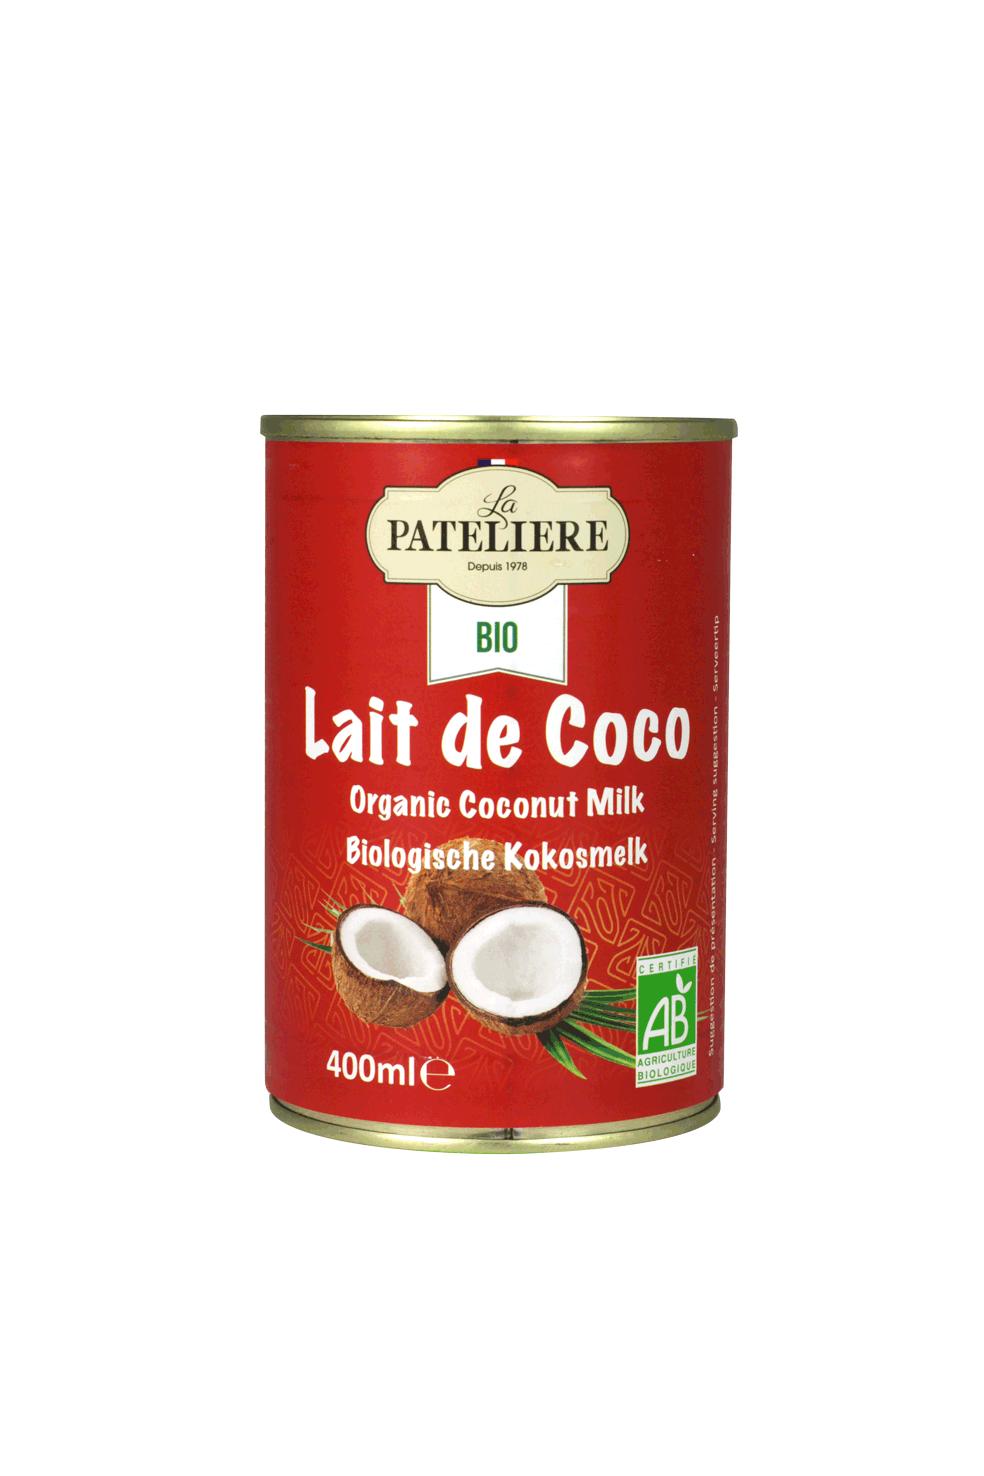 lait-coco bio LA PATELIERE